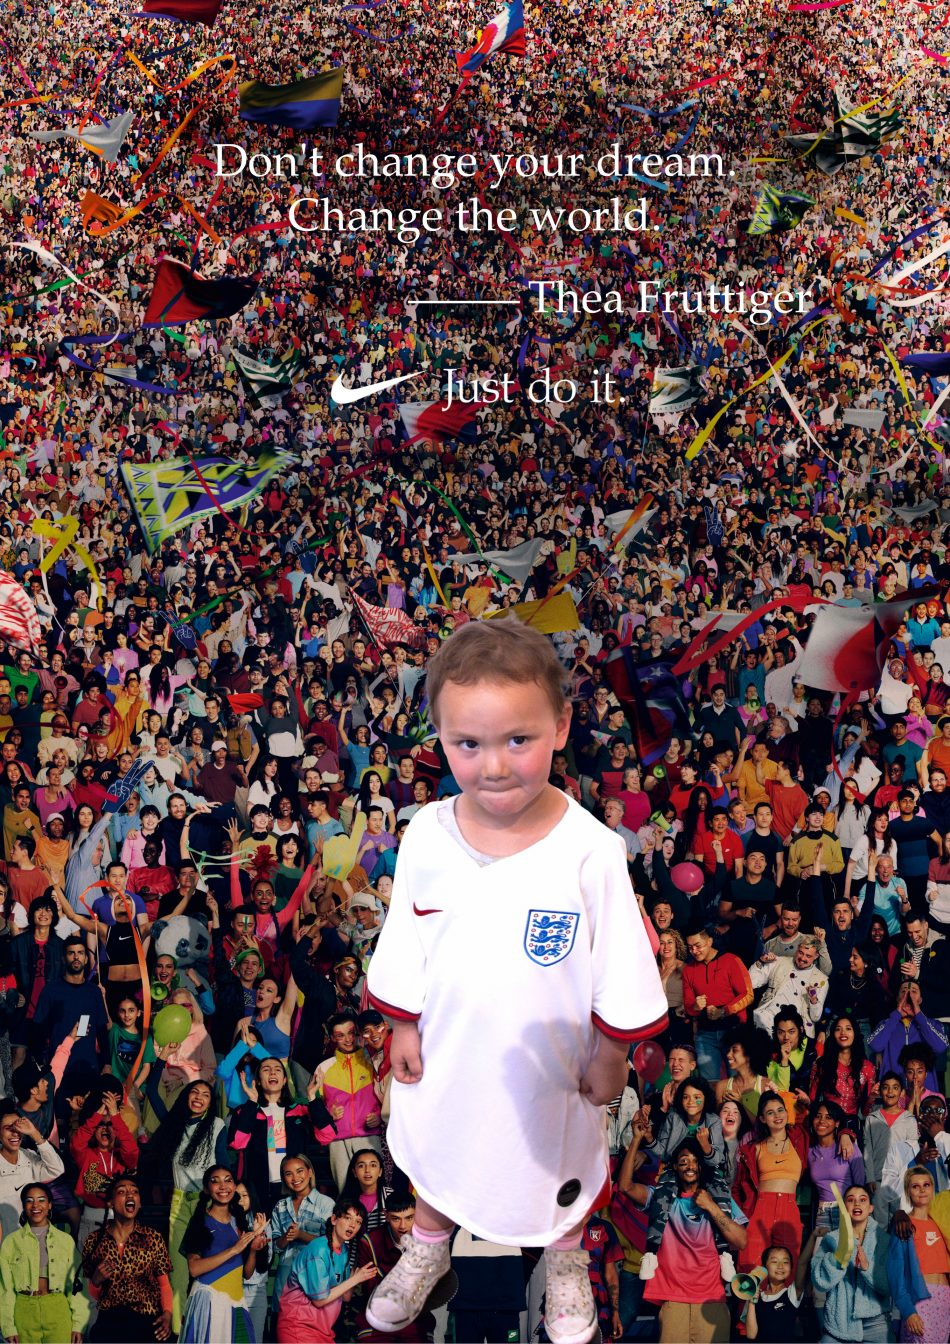 Nike Wall of Dreams